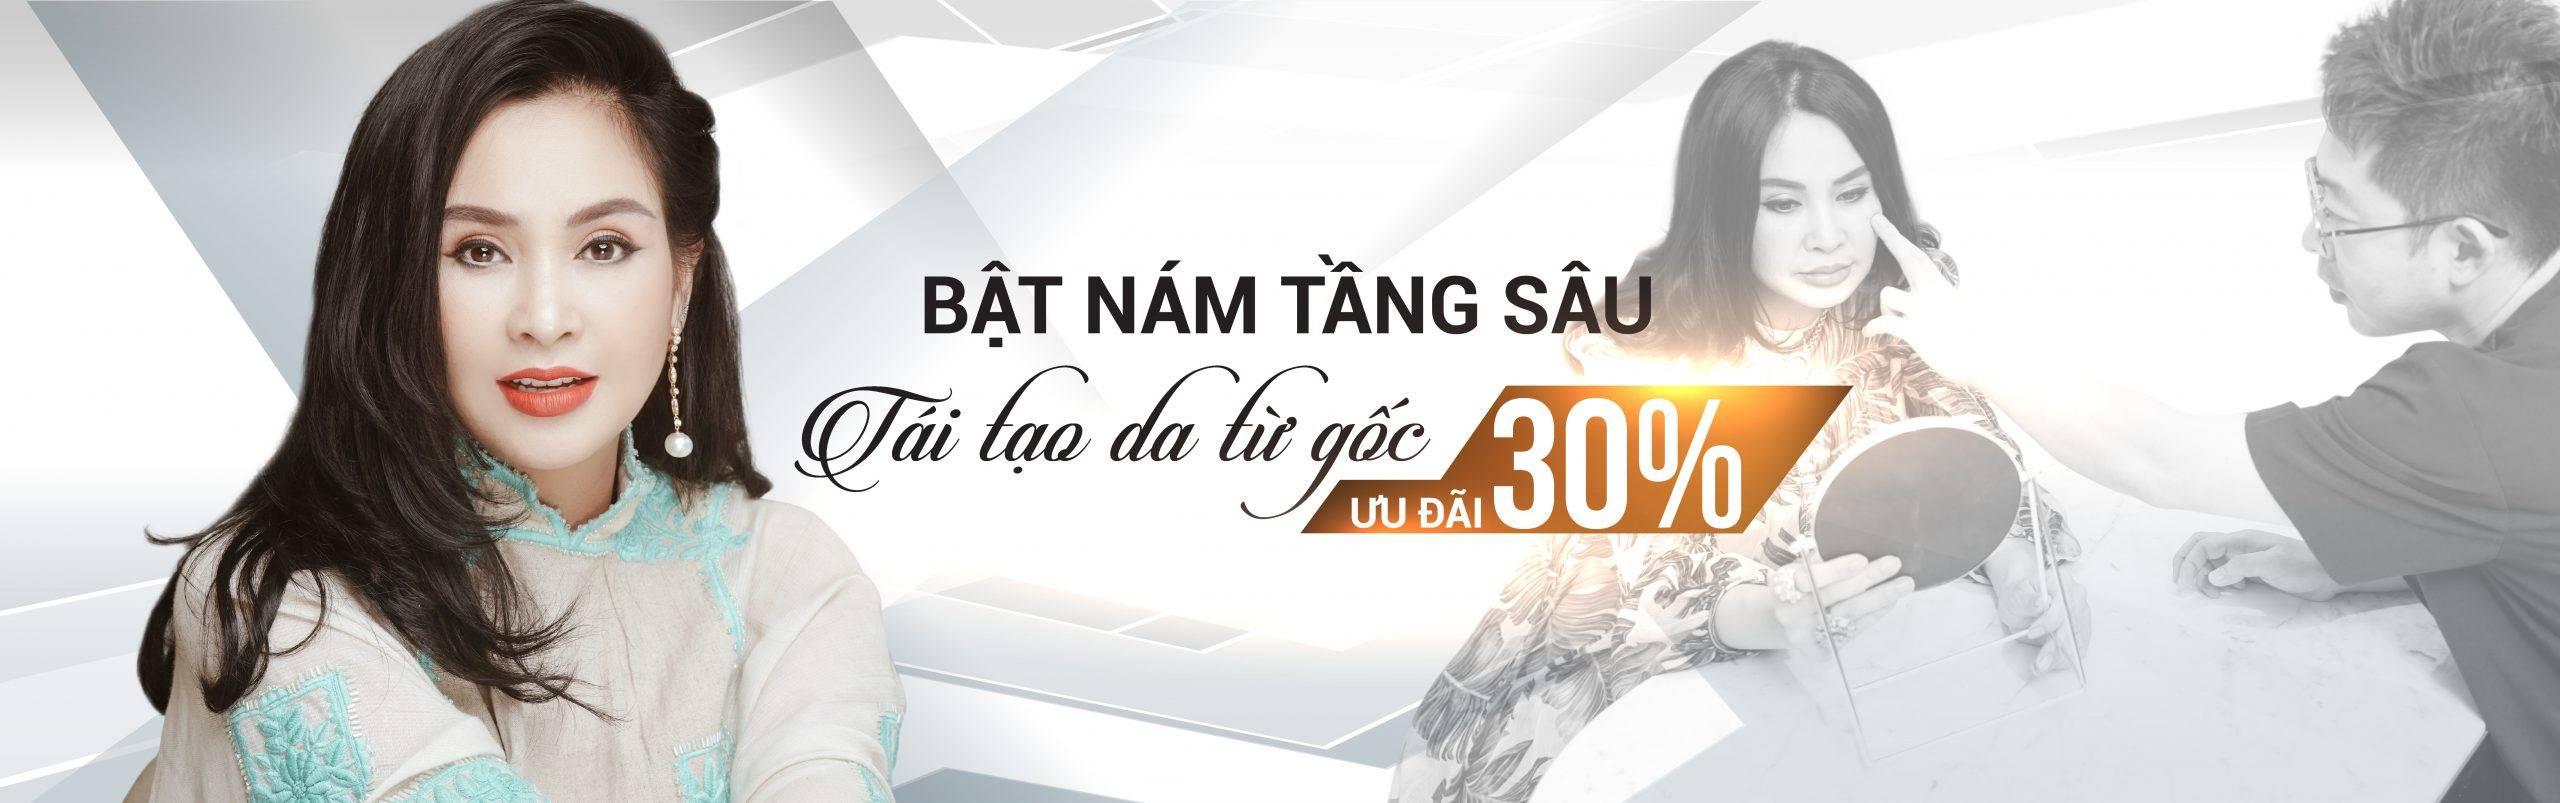 tri-nam-sam-do-korea-banner